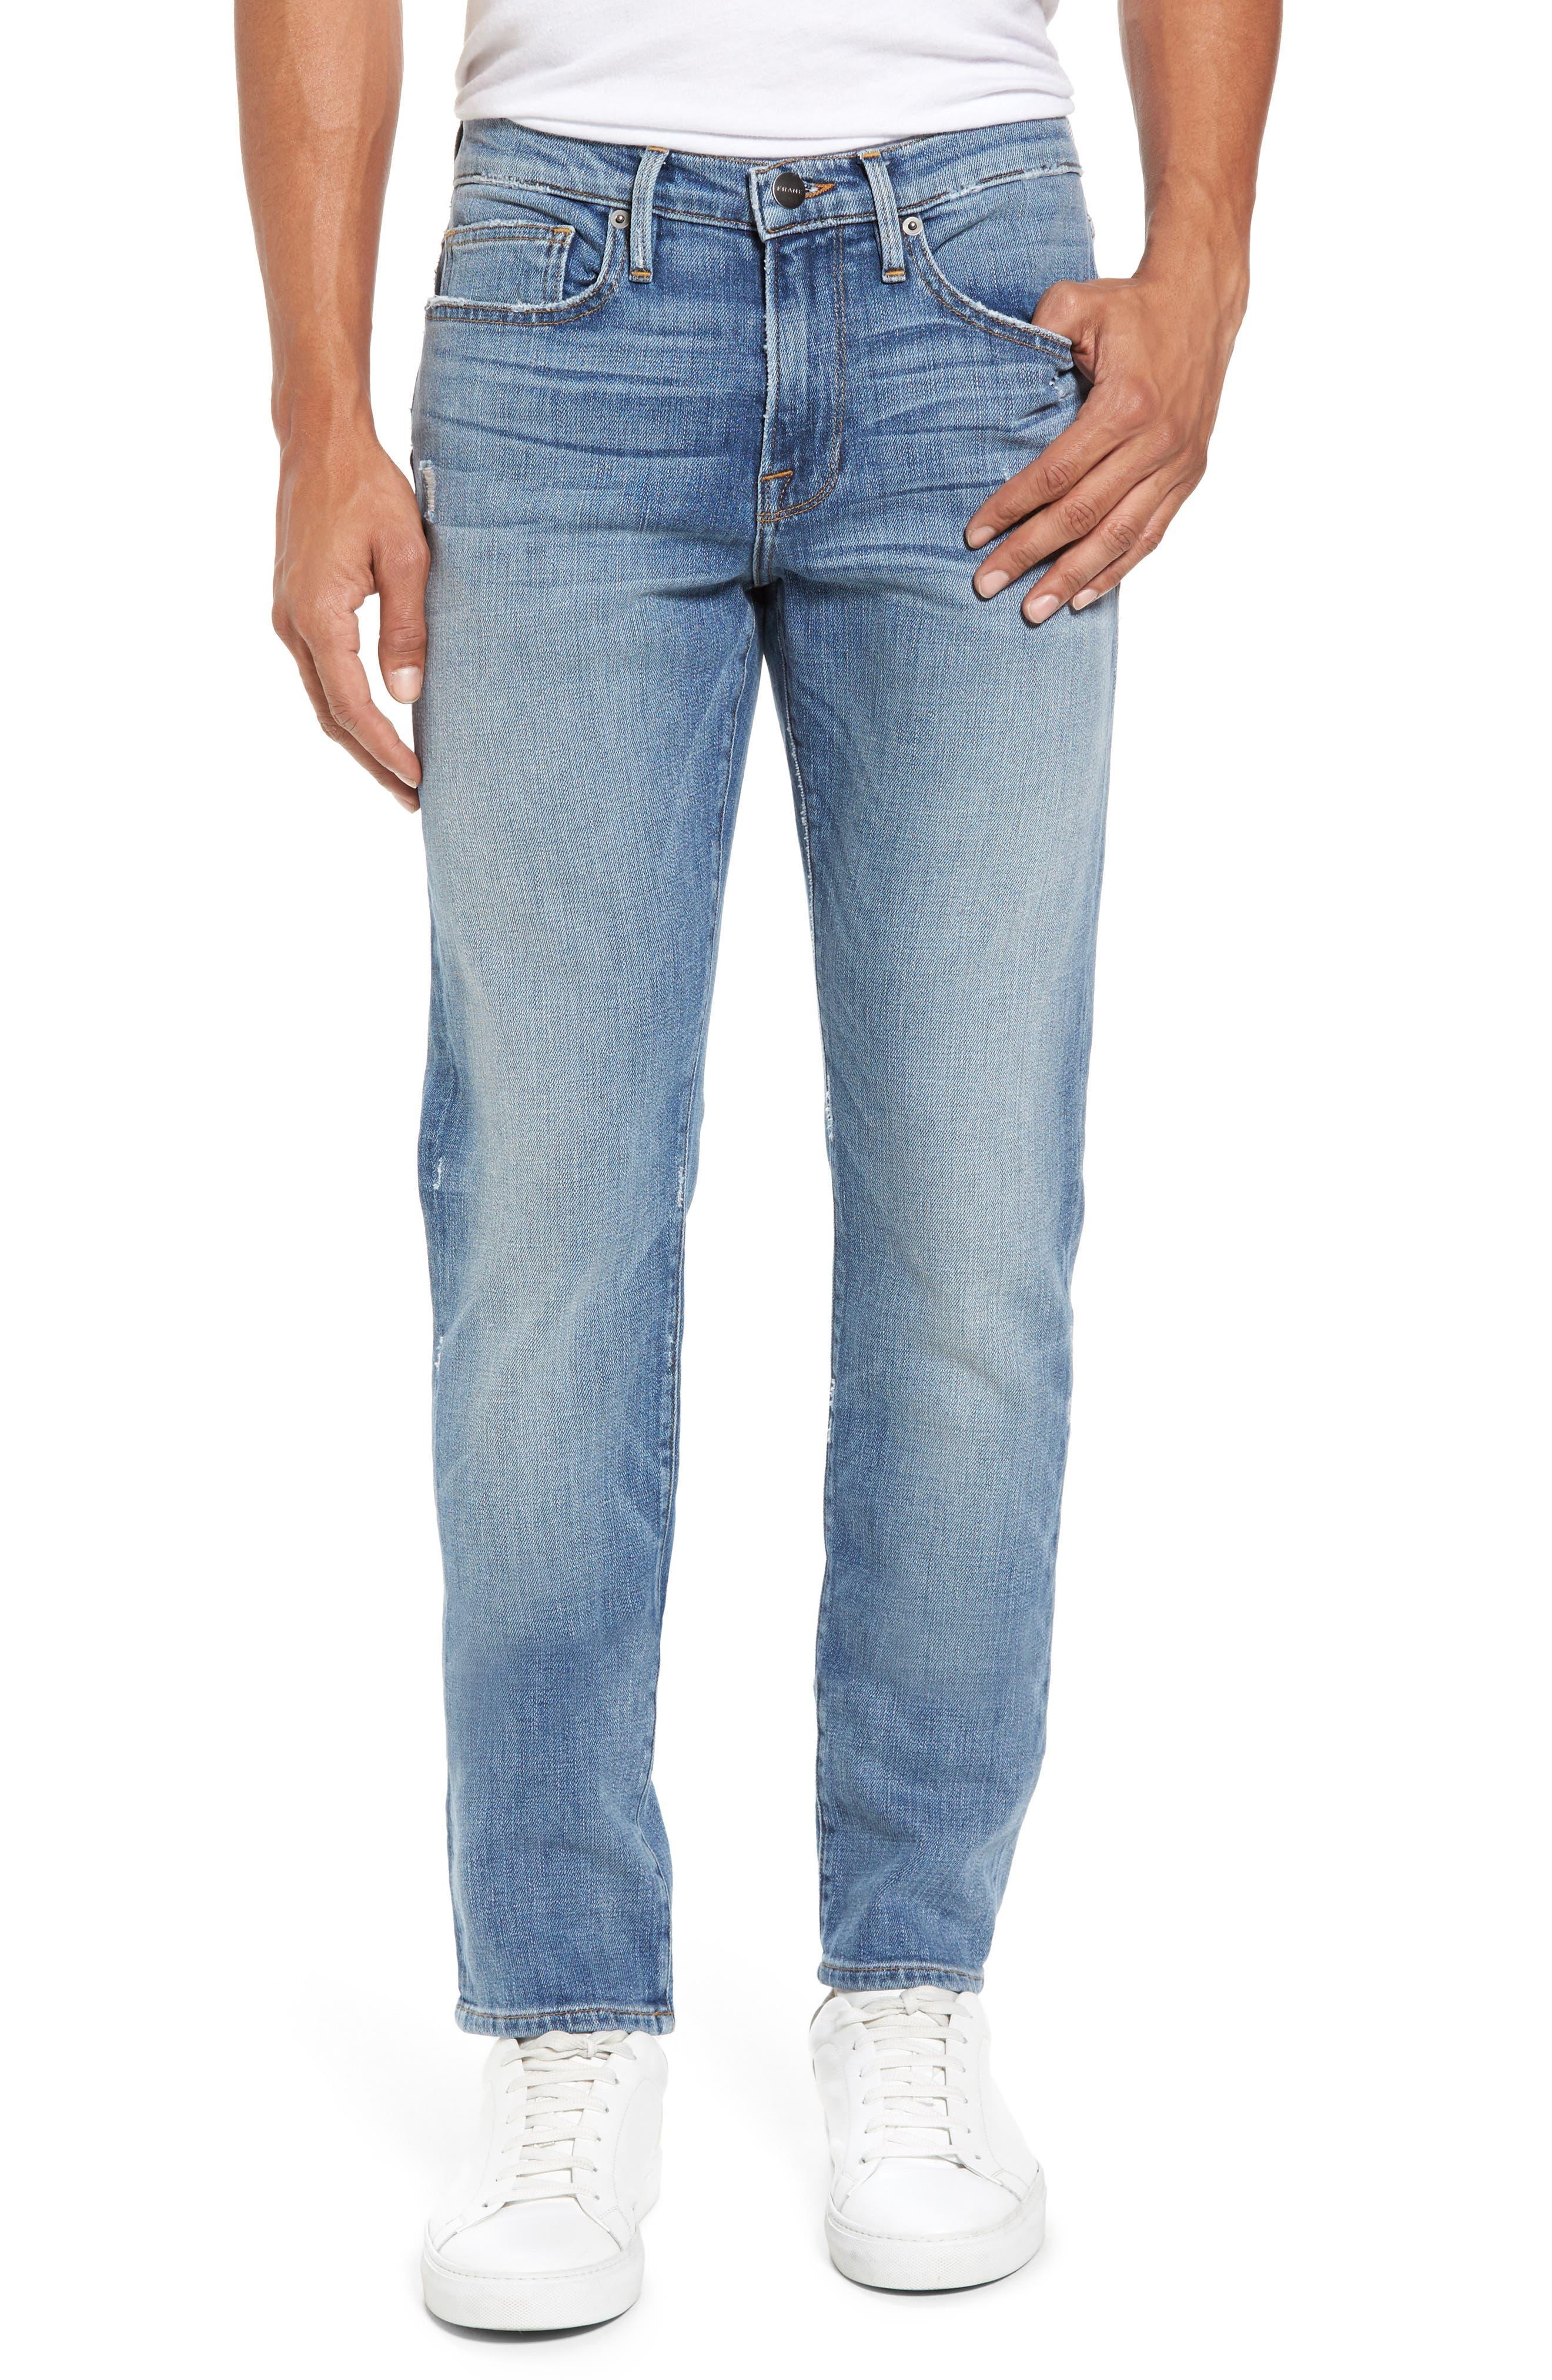 L'Homme Slim Fit Jeans,                         Main,                         color, Beaudry